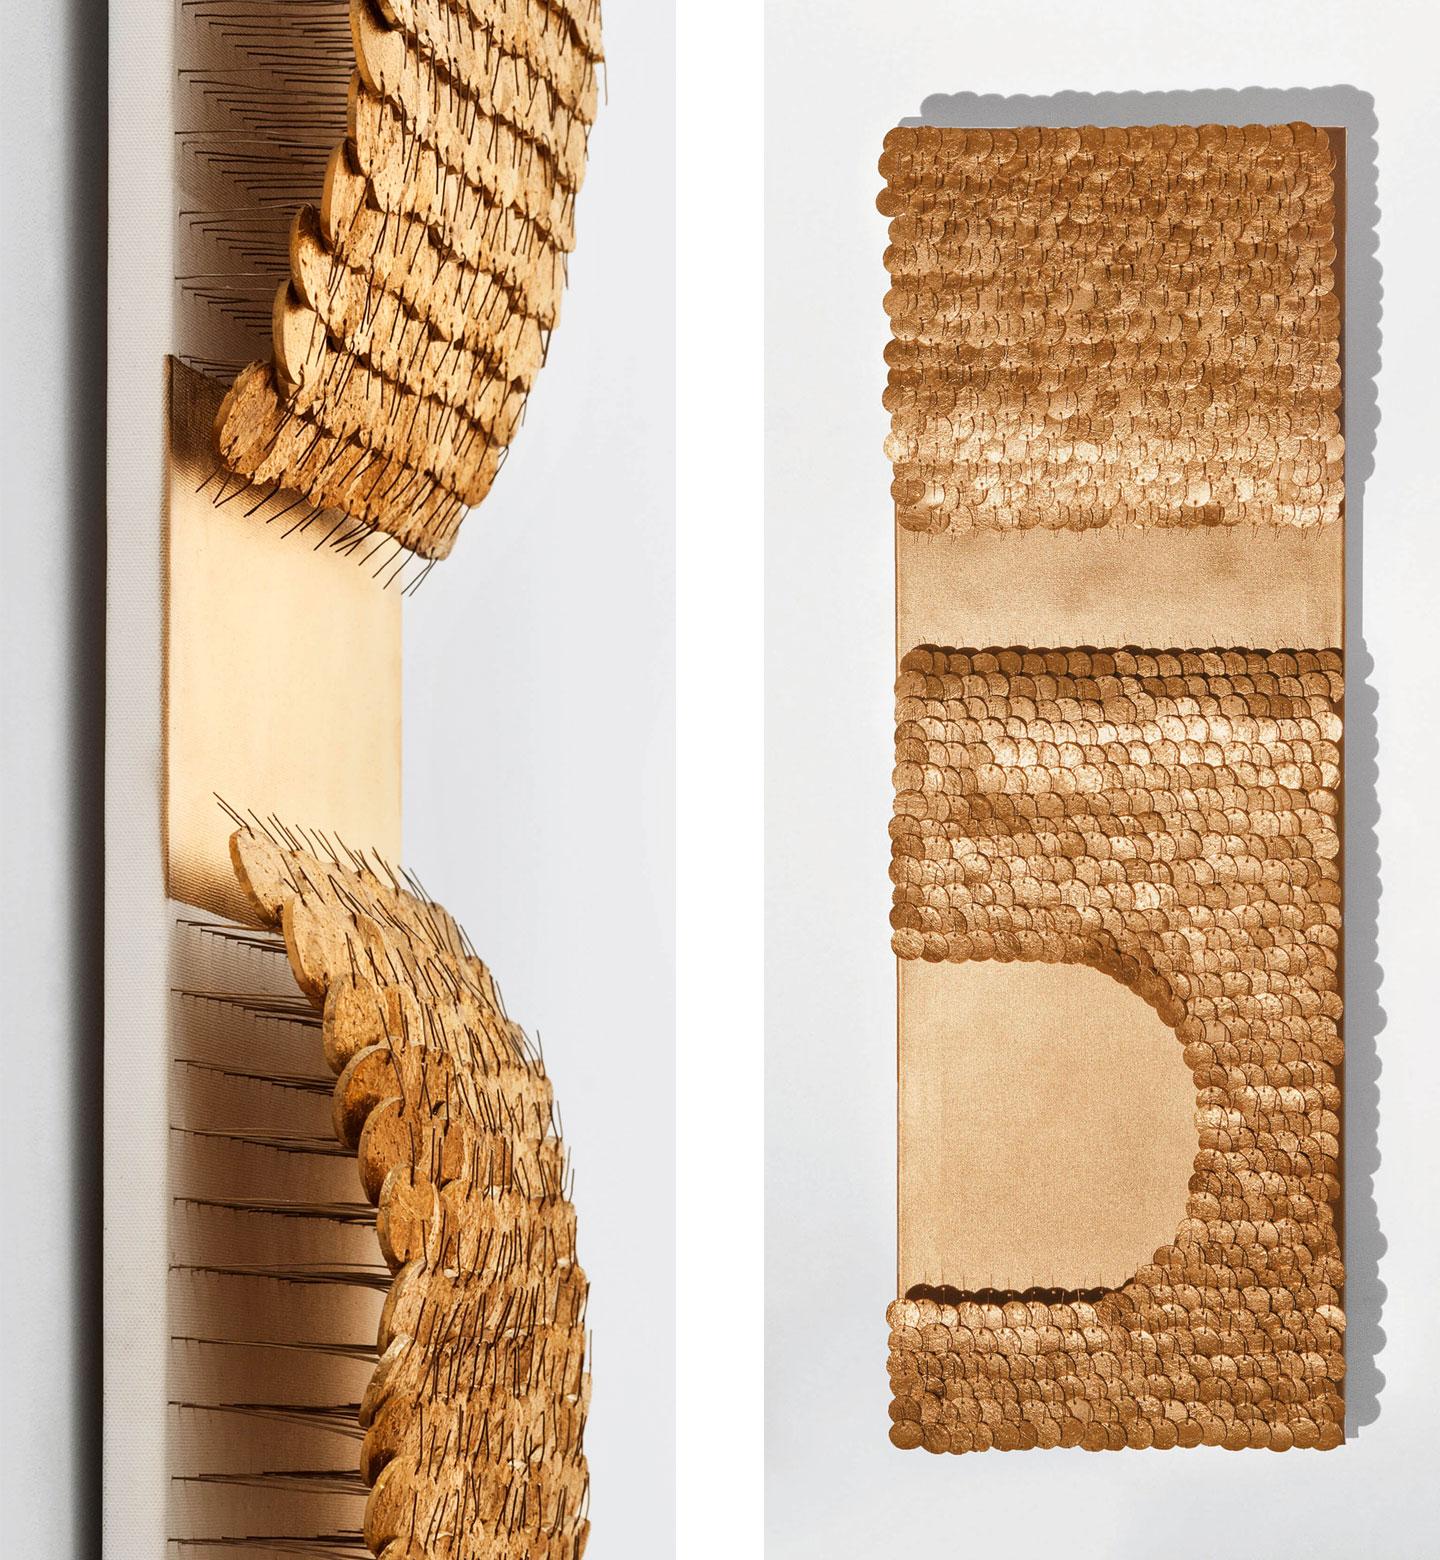 Tutanchamun, 2012, Flaschenkork, Draht, Autolack auf Leinwand Bildmaß 120×40 cm